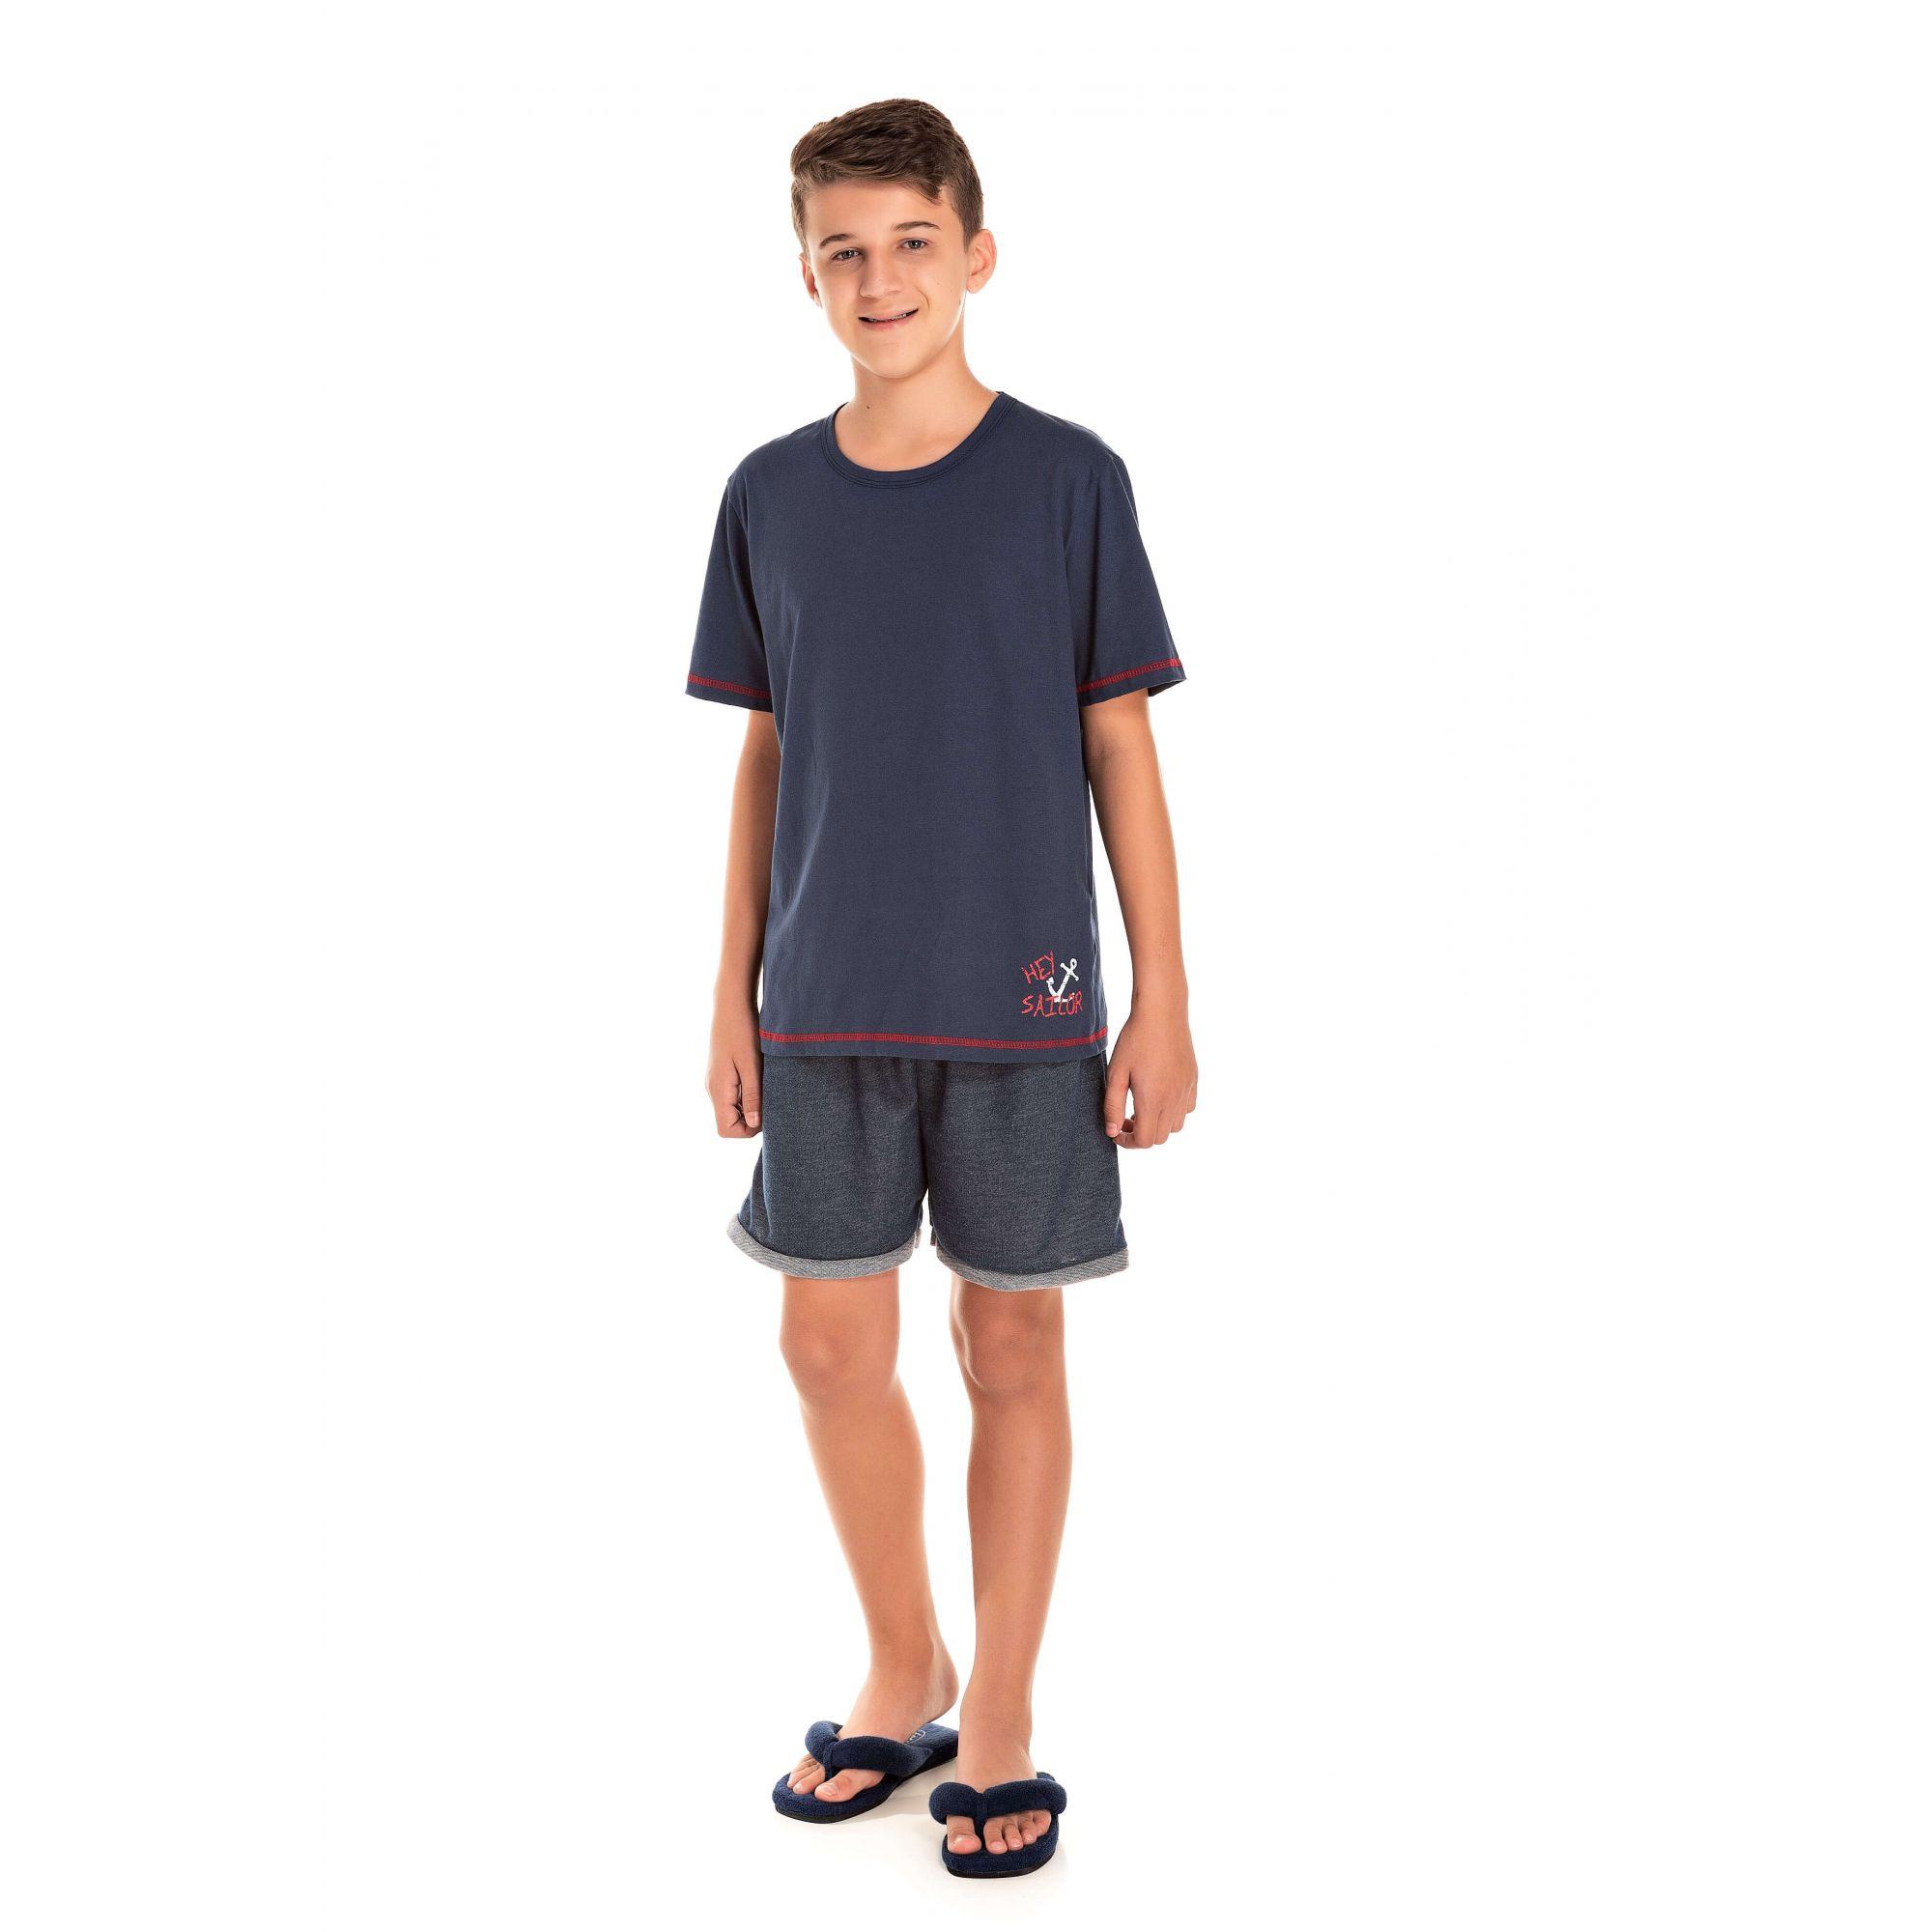 Pijama Juvenil Masculino Hey Sailor - Marinho